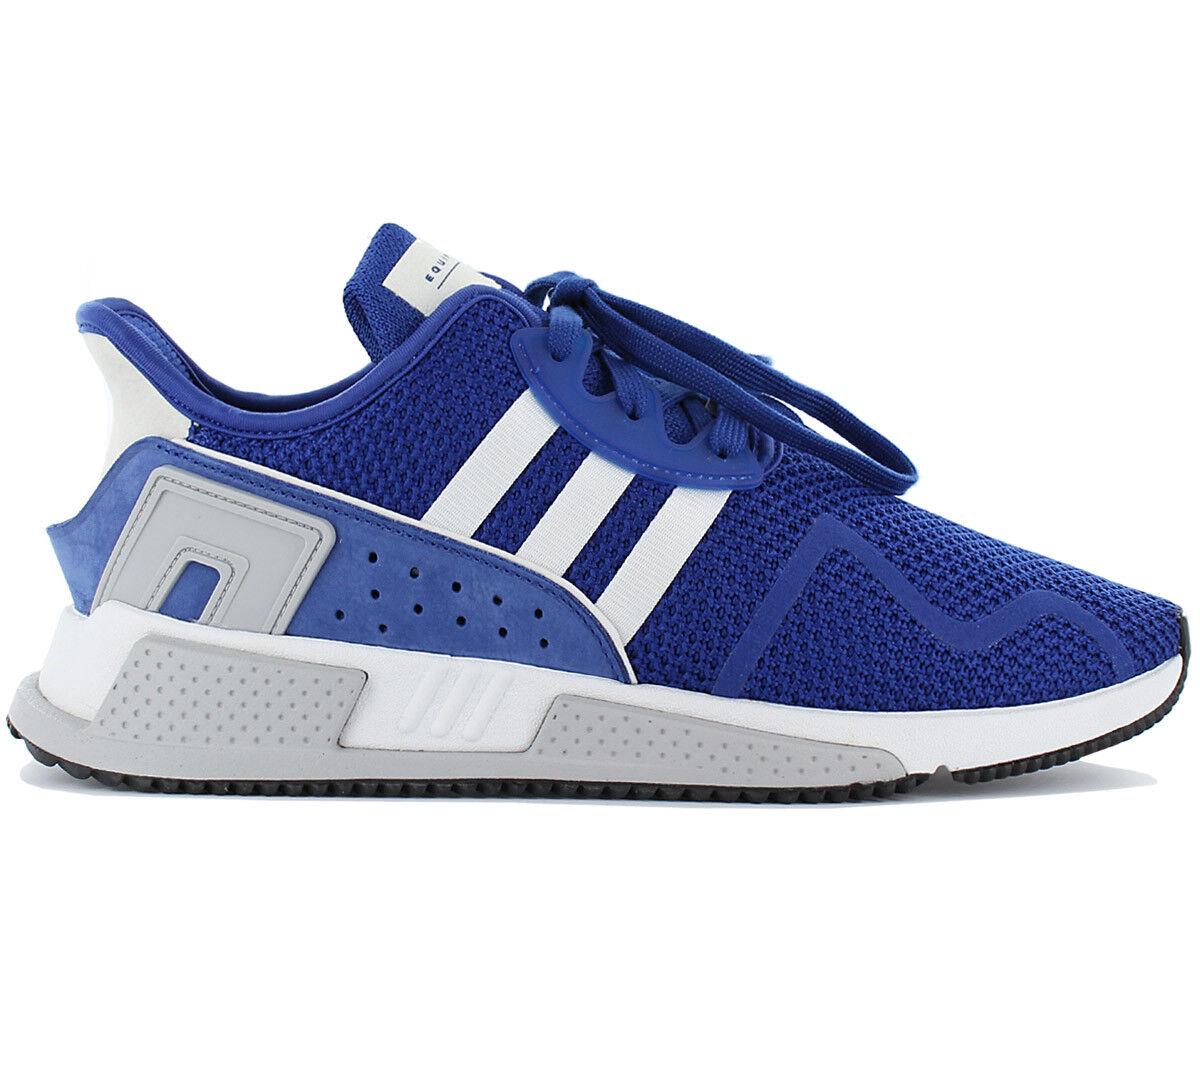 Adidas Equipment Cushion ADV Herren Turnschuhe Schuhe Bask Bask Bask Support EQT CQ2380 NEU 1cbcae